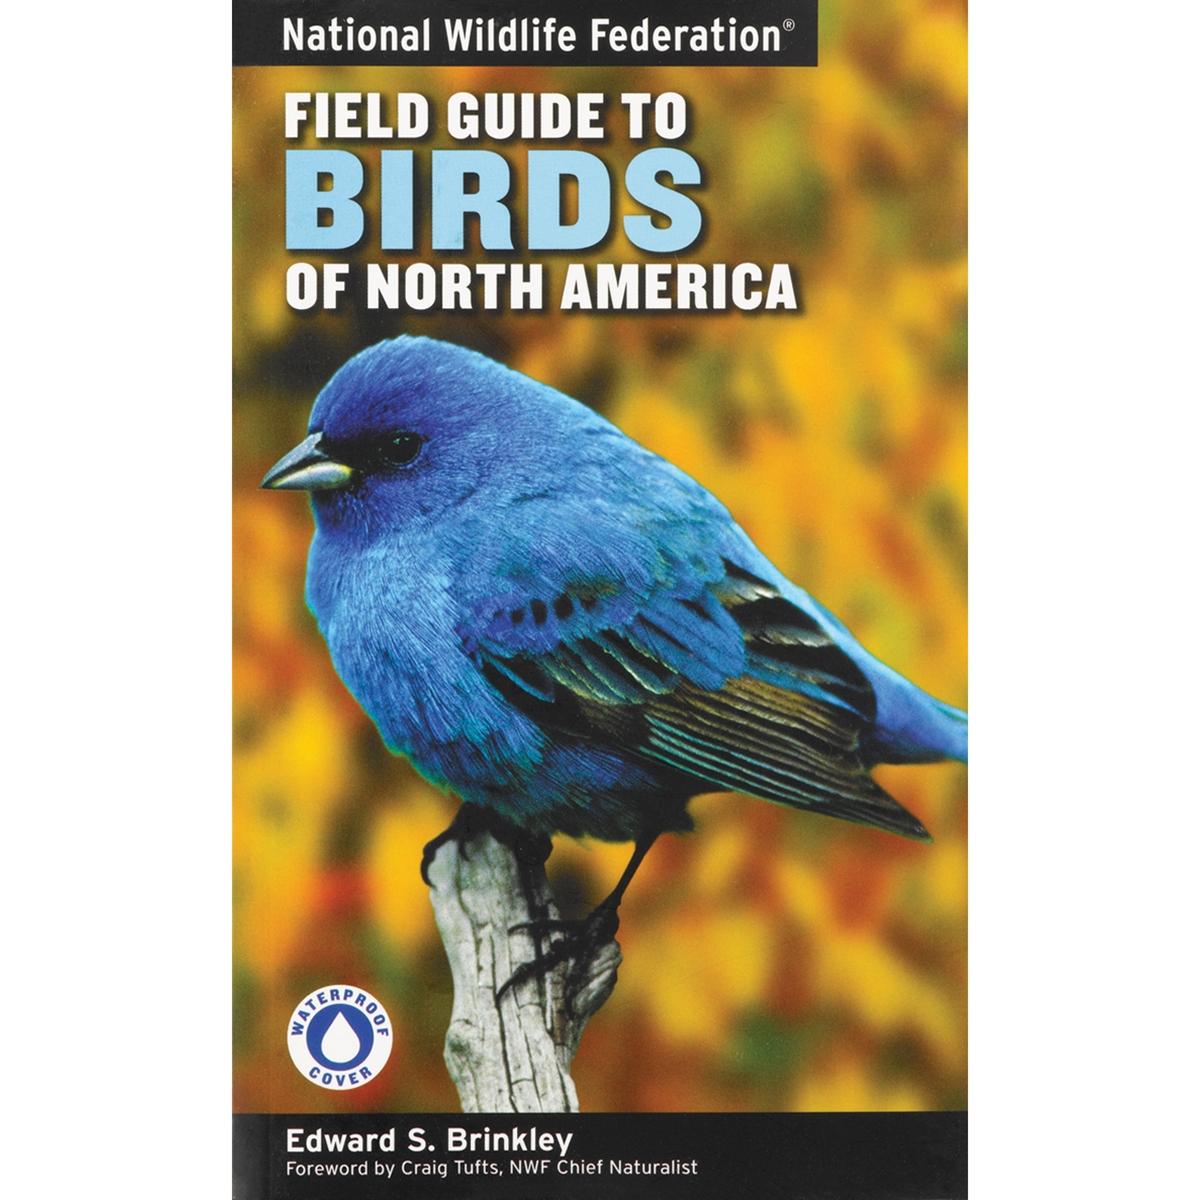 NWF Field Guide to Birds